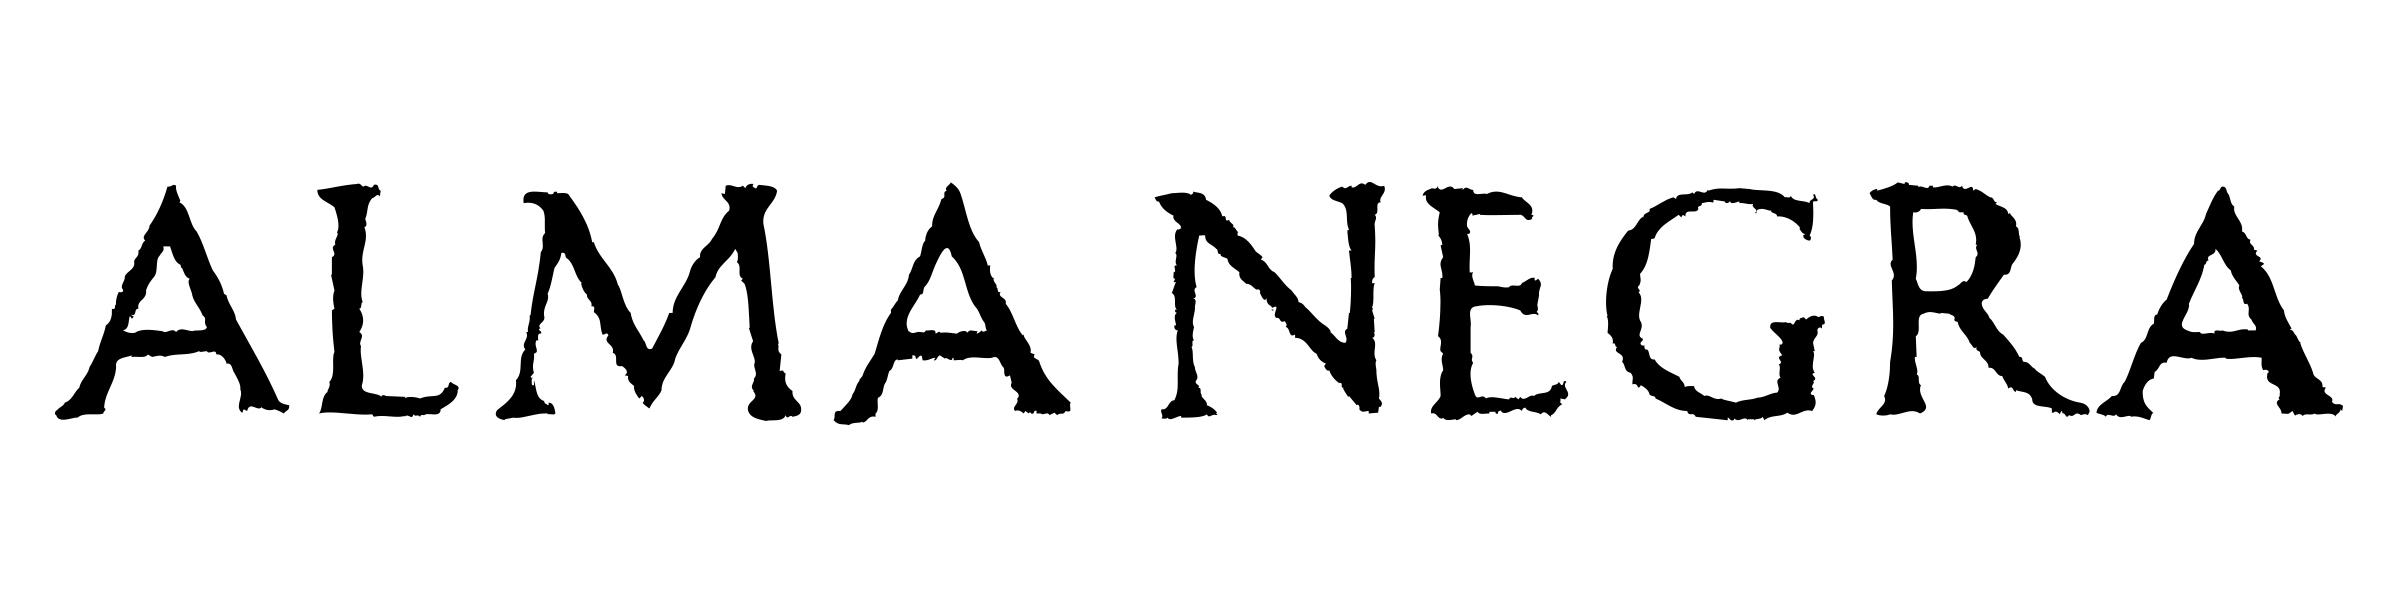 AlmaNegra logo (with space).jpg